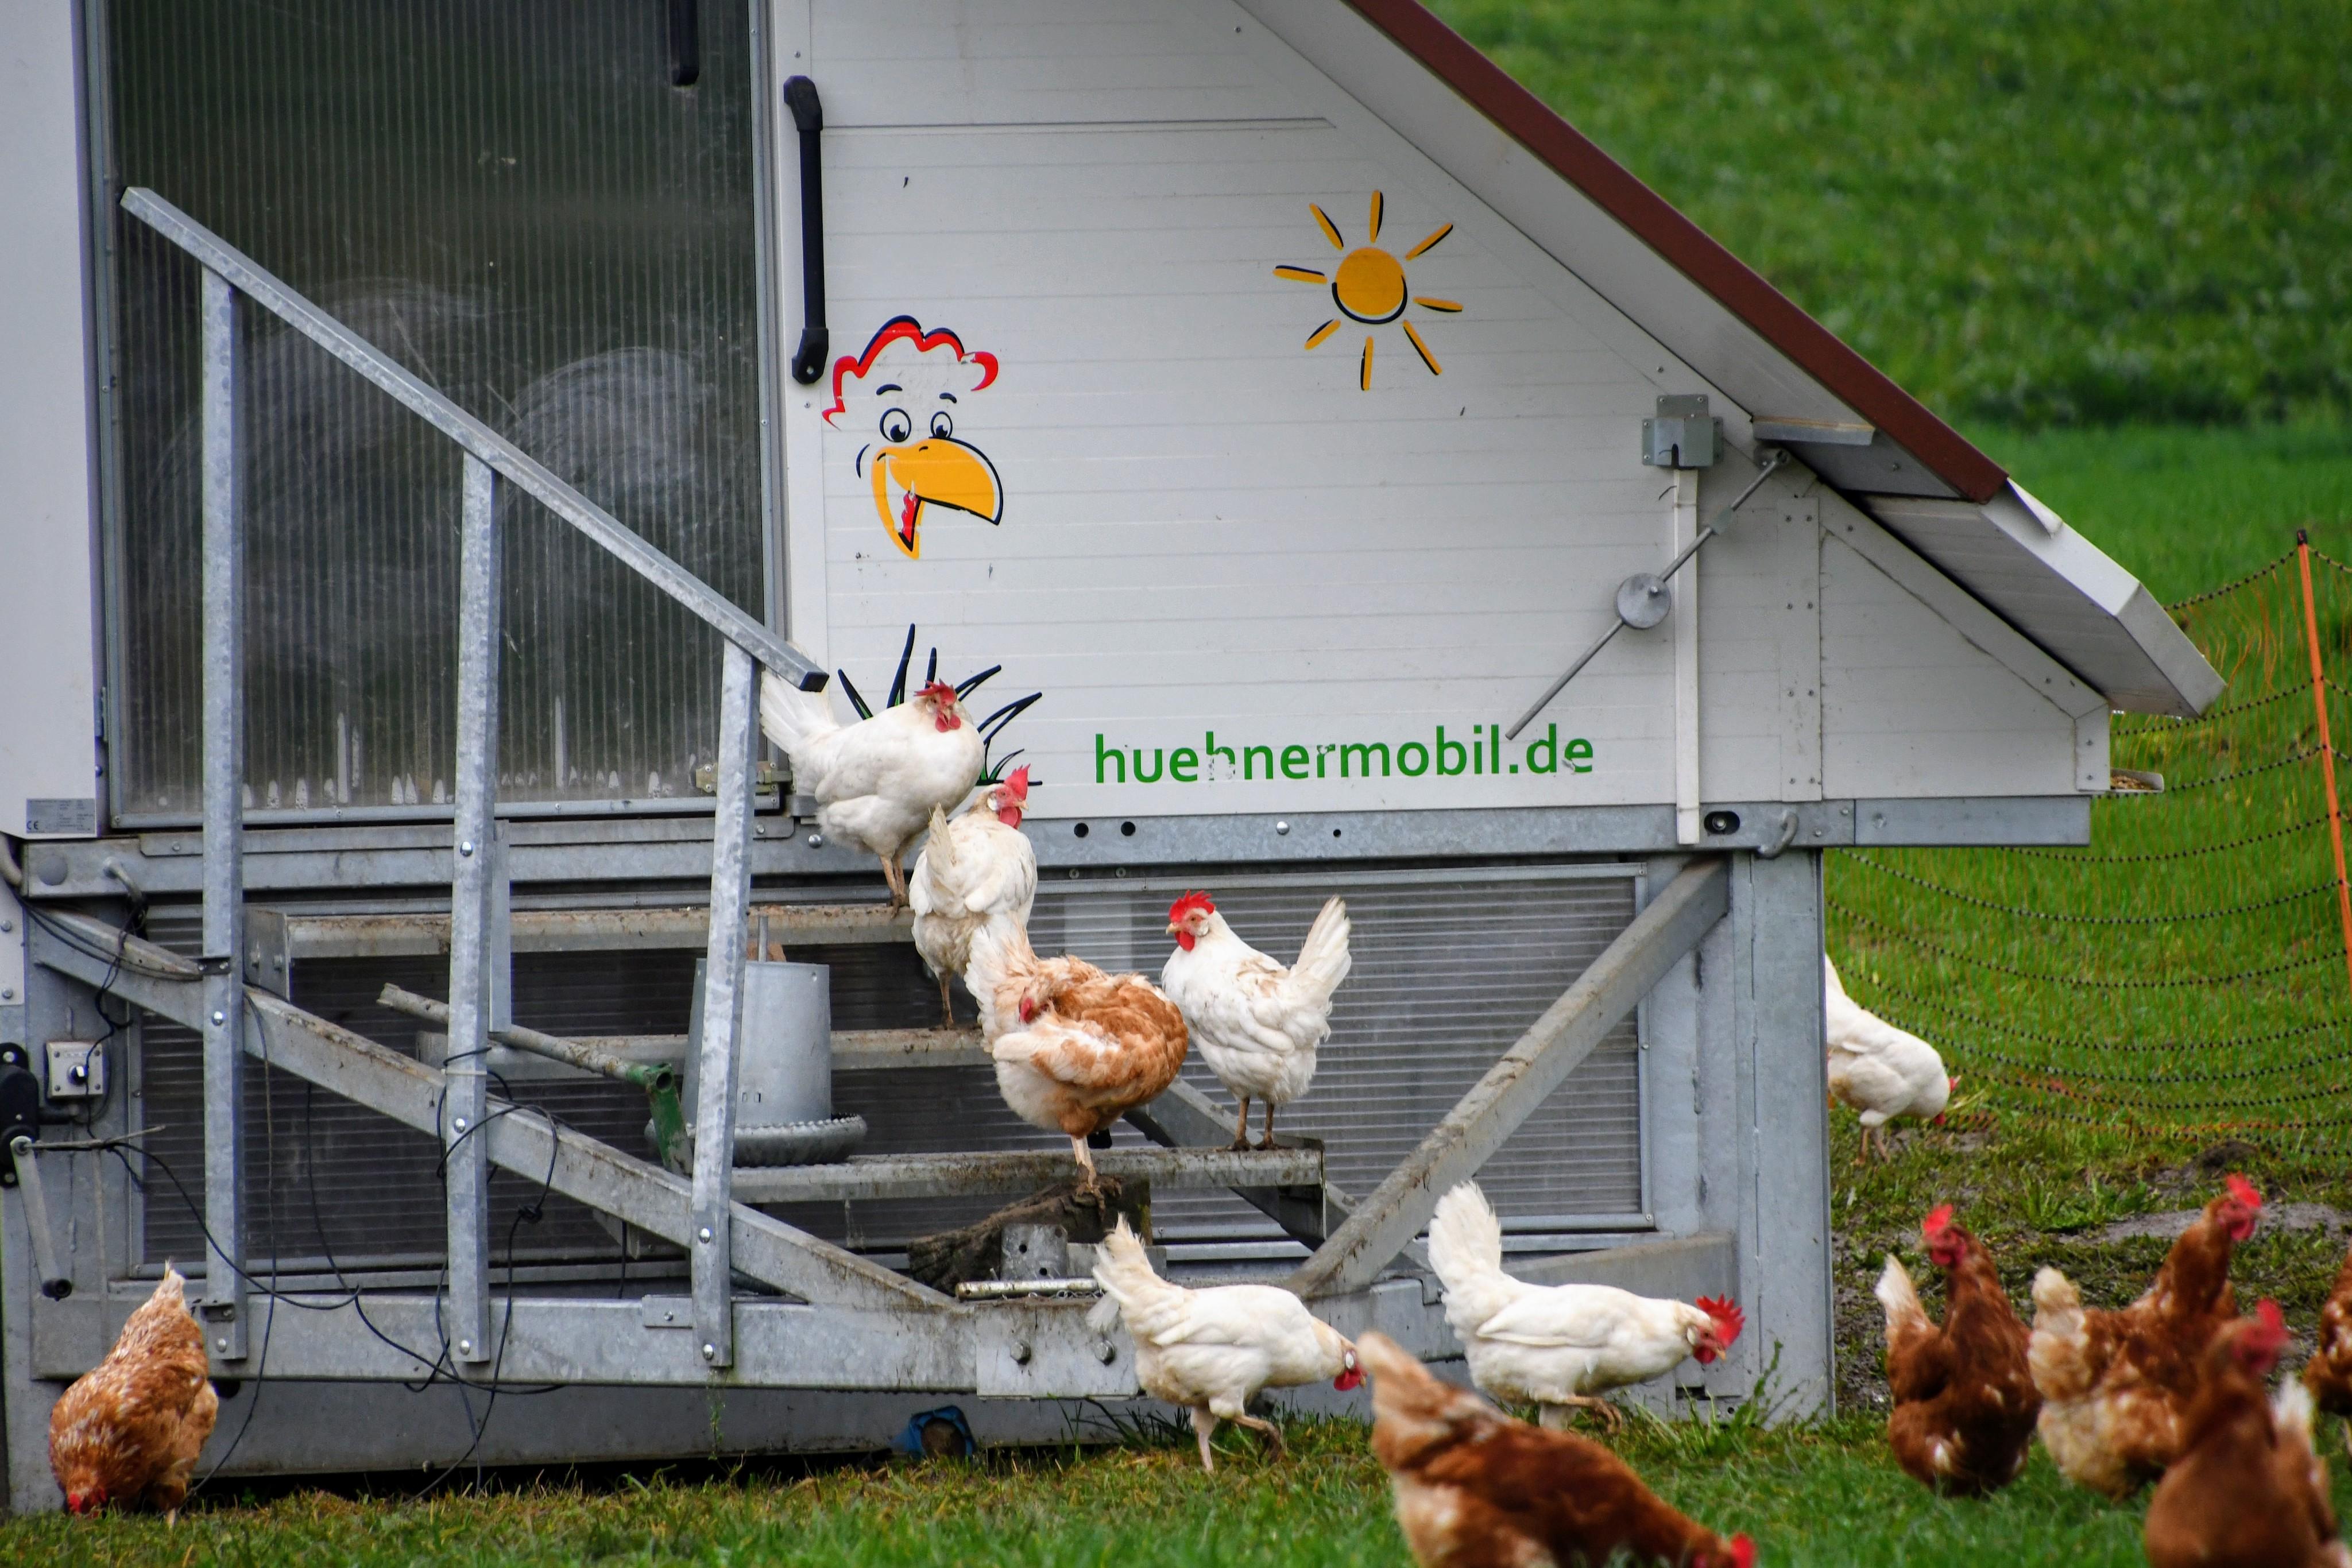 chickens-01.11-2